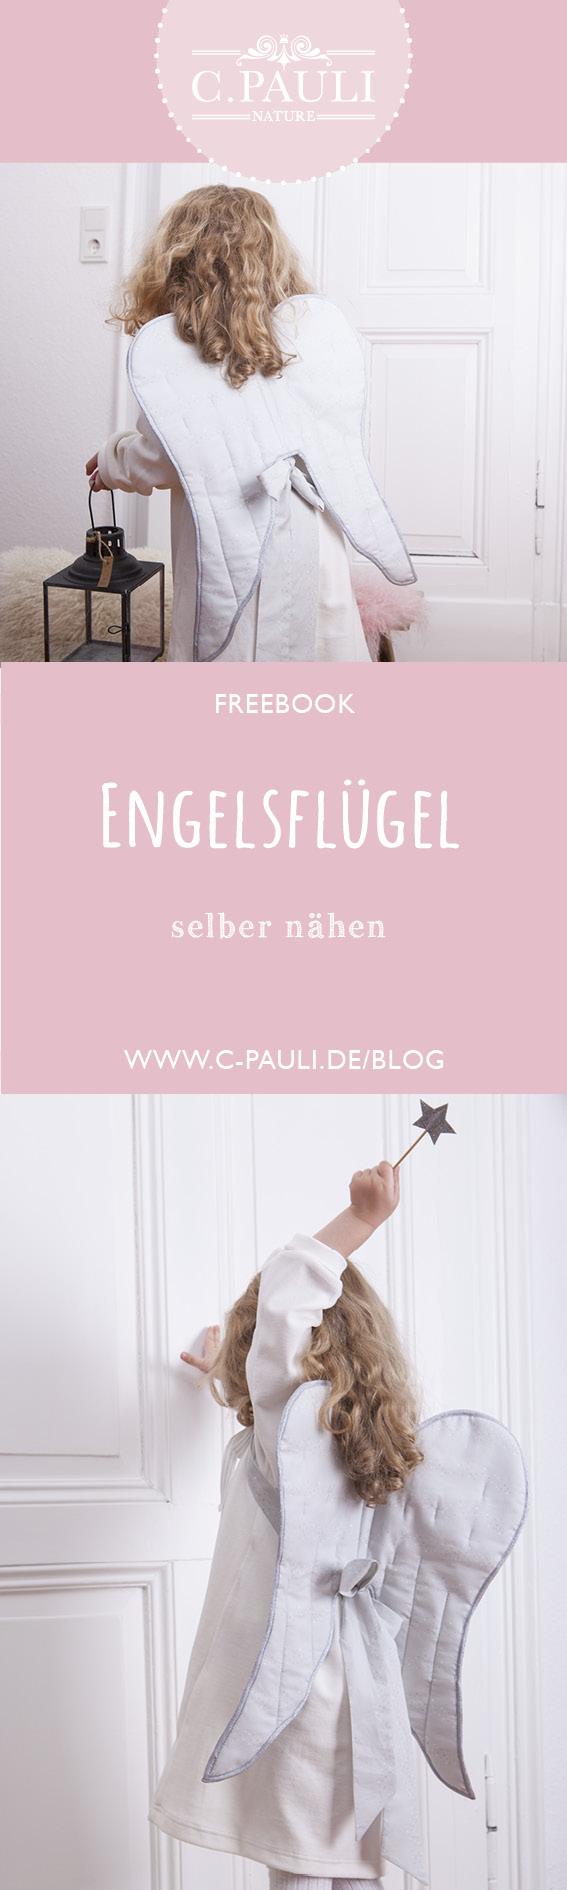 Engelsflügel C Pauli Nature Blog